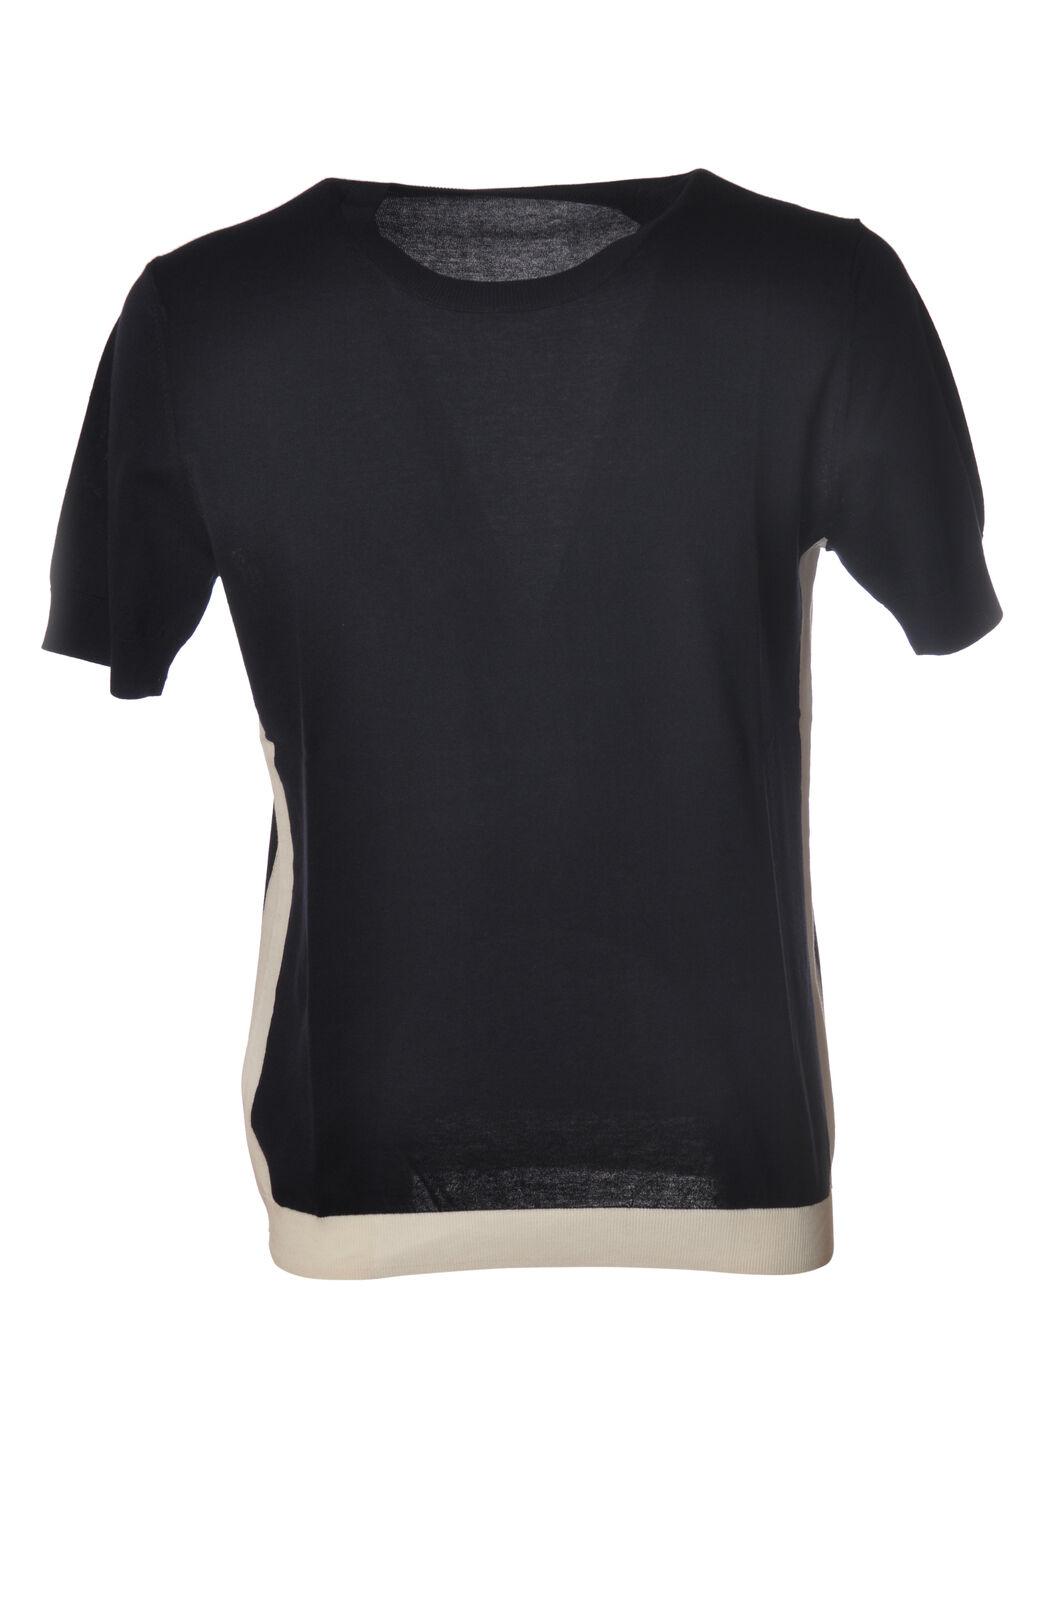 Paolo Pecora - Knitwear-schweißers - Man - Blau - 6098309G191153